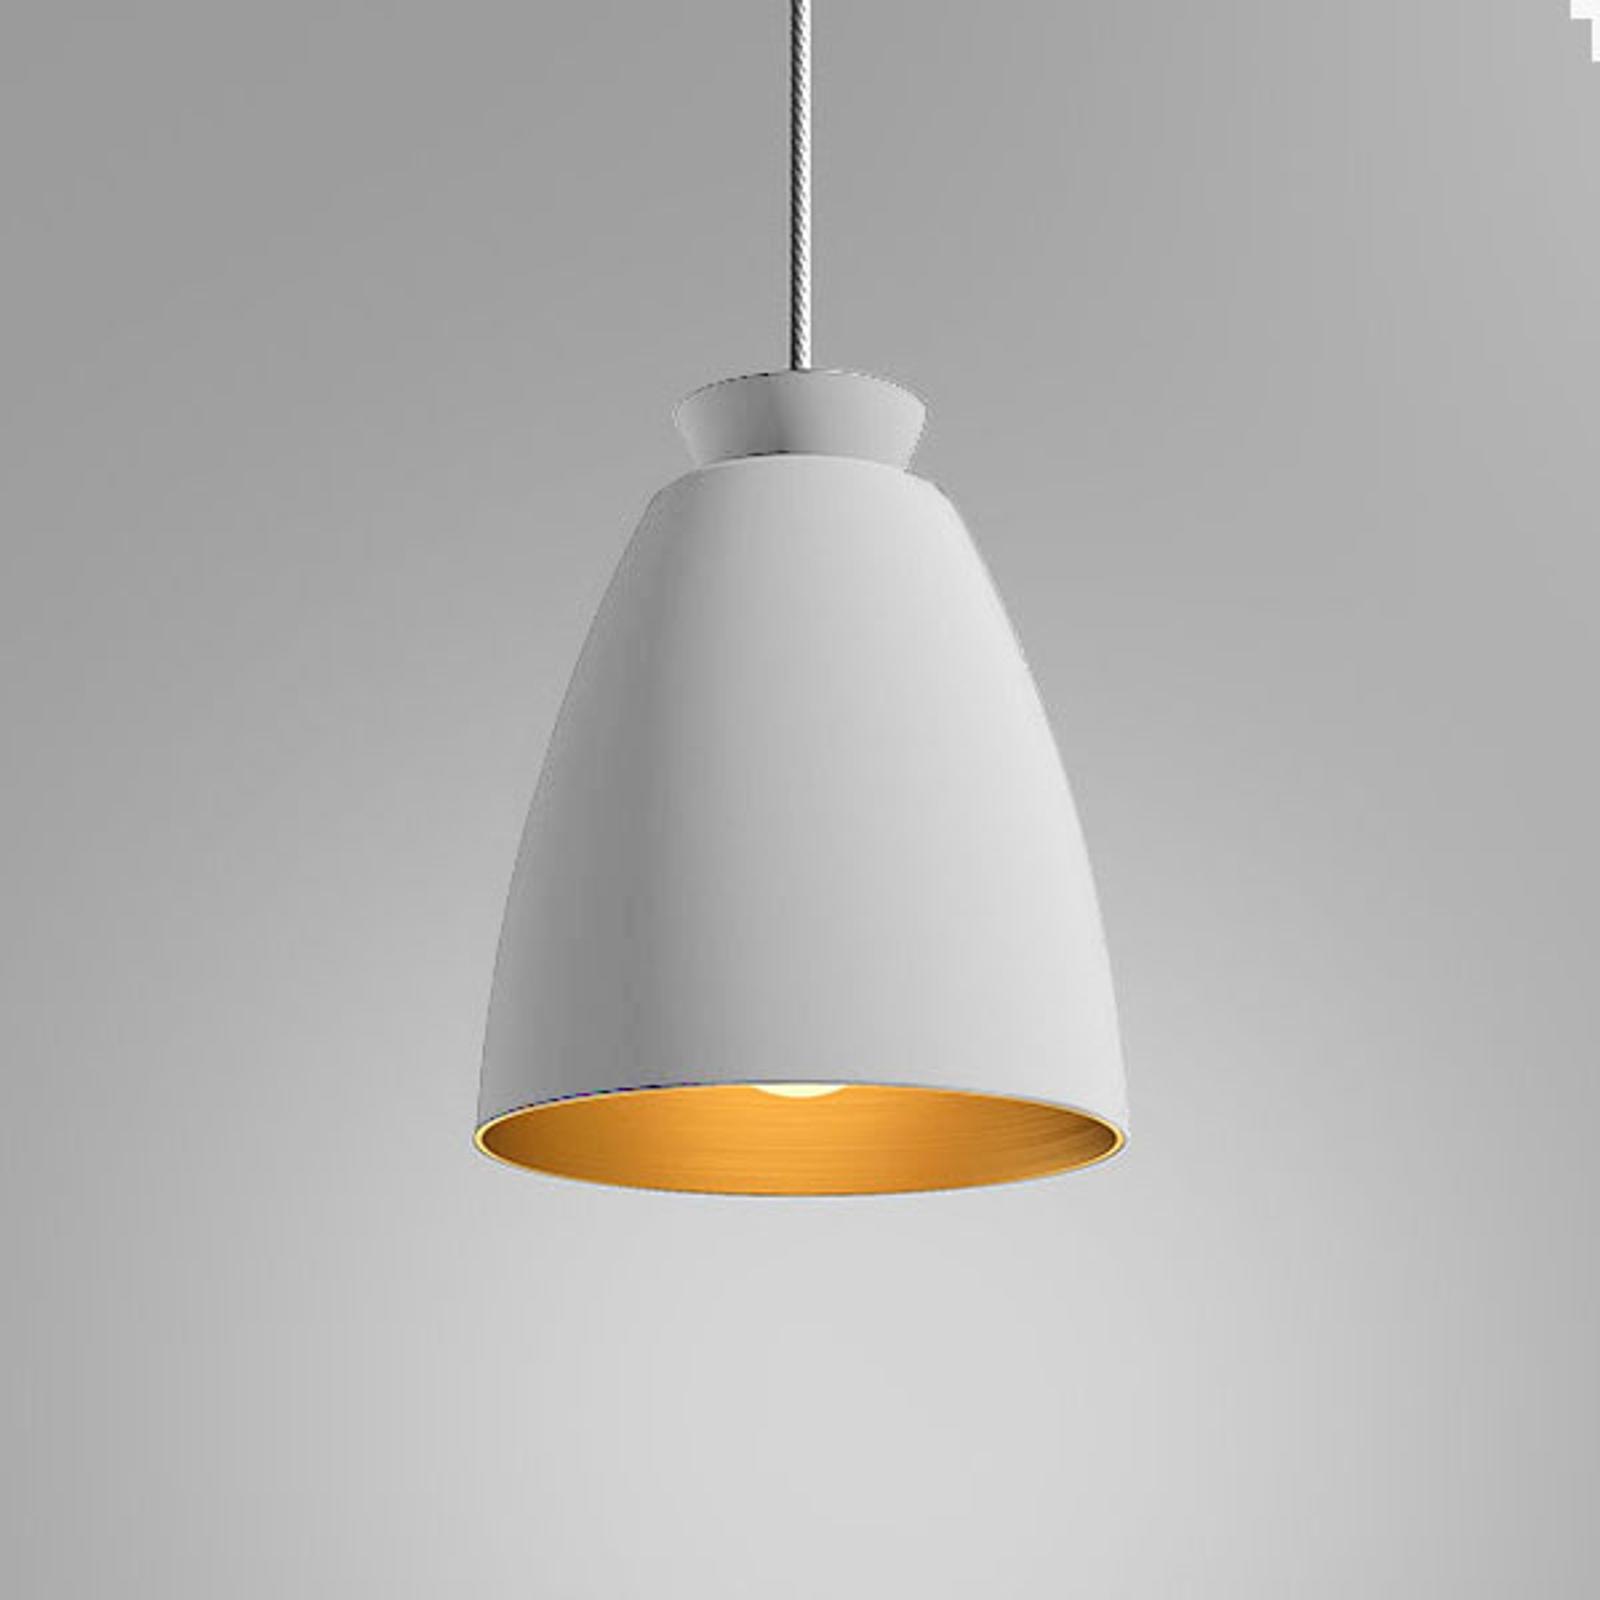 Innermost Chelsea - lampa wisząca Ø 18cm biała